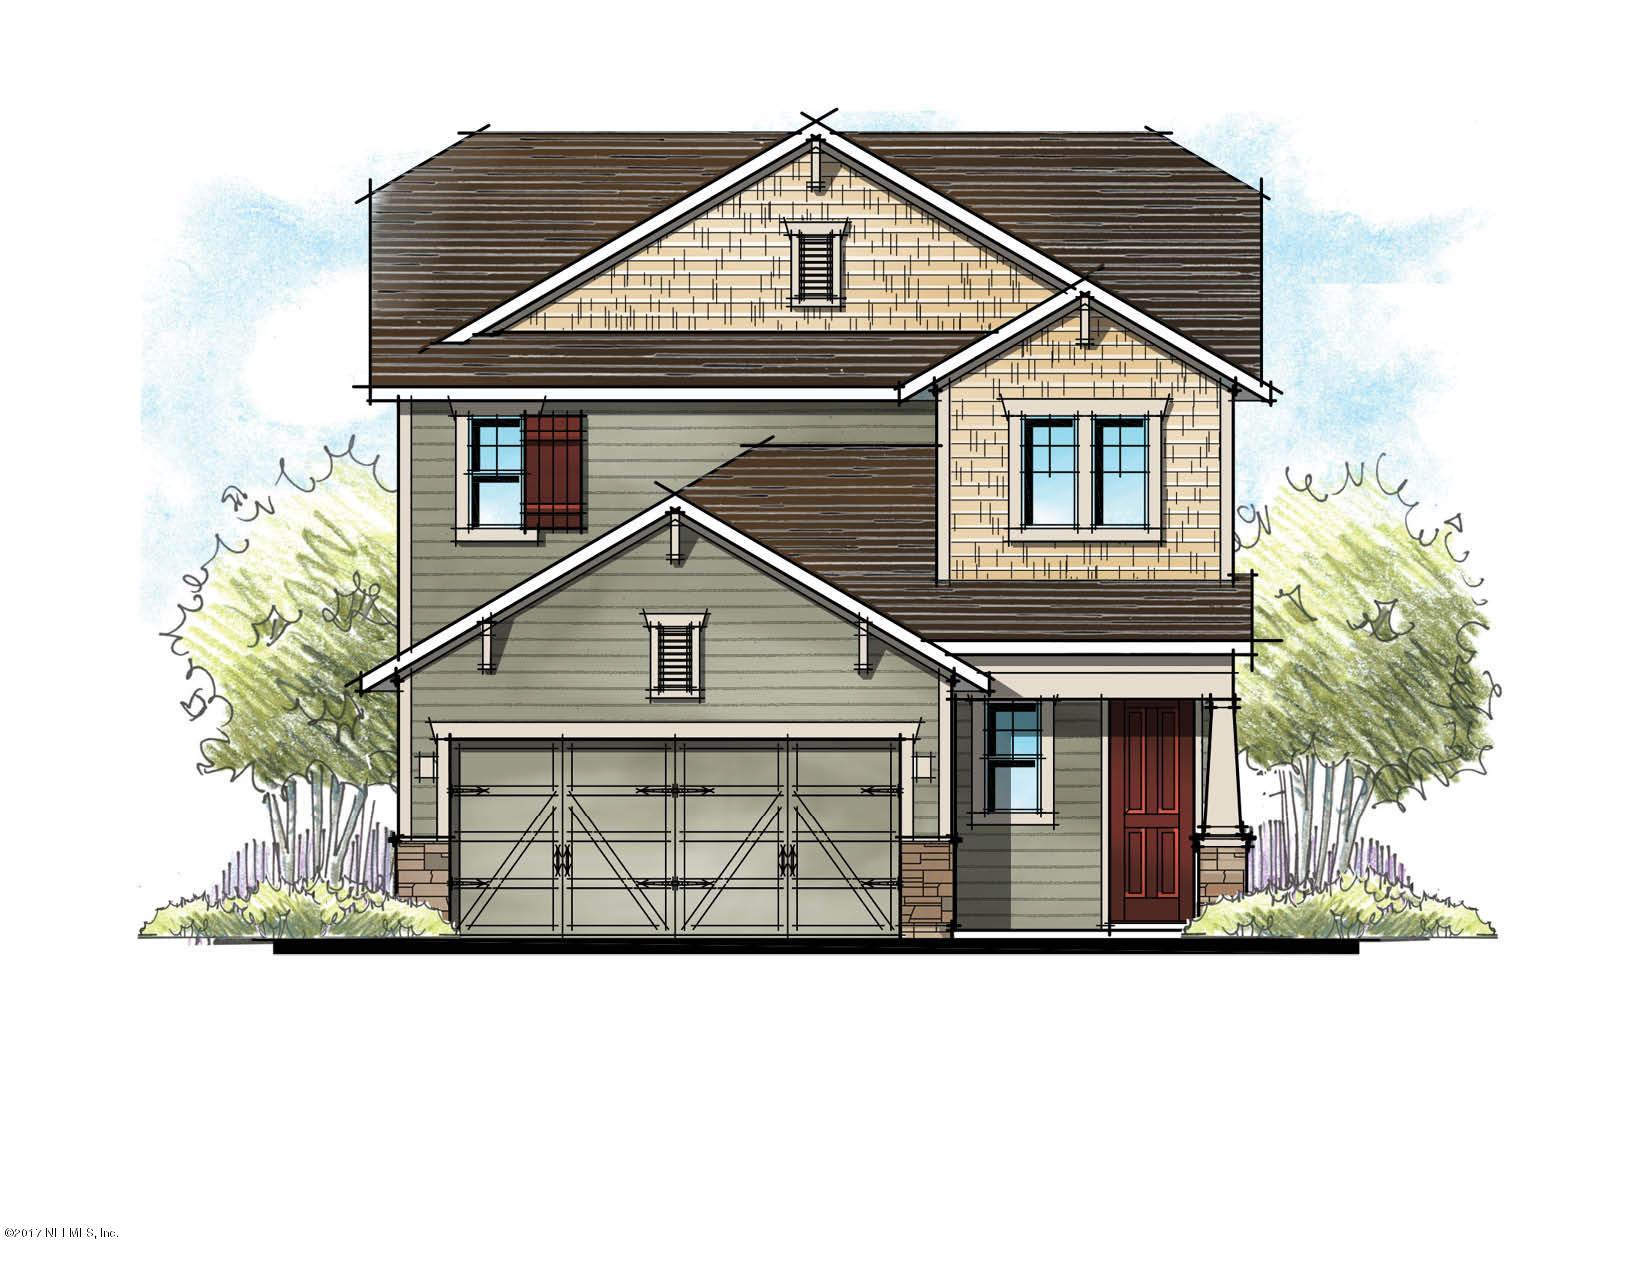 126 TABBY LAKE,ST AUGUSTINE,FLORIDA 32092,4 Bedrooms Bedrooms,2 BathroomsBathrooms,Residential - single family,TABBY LAKE,866493